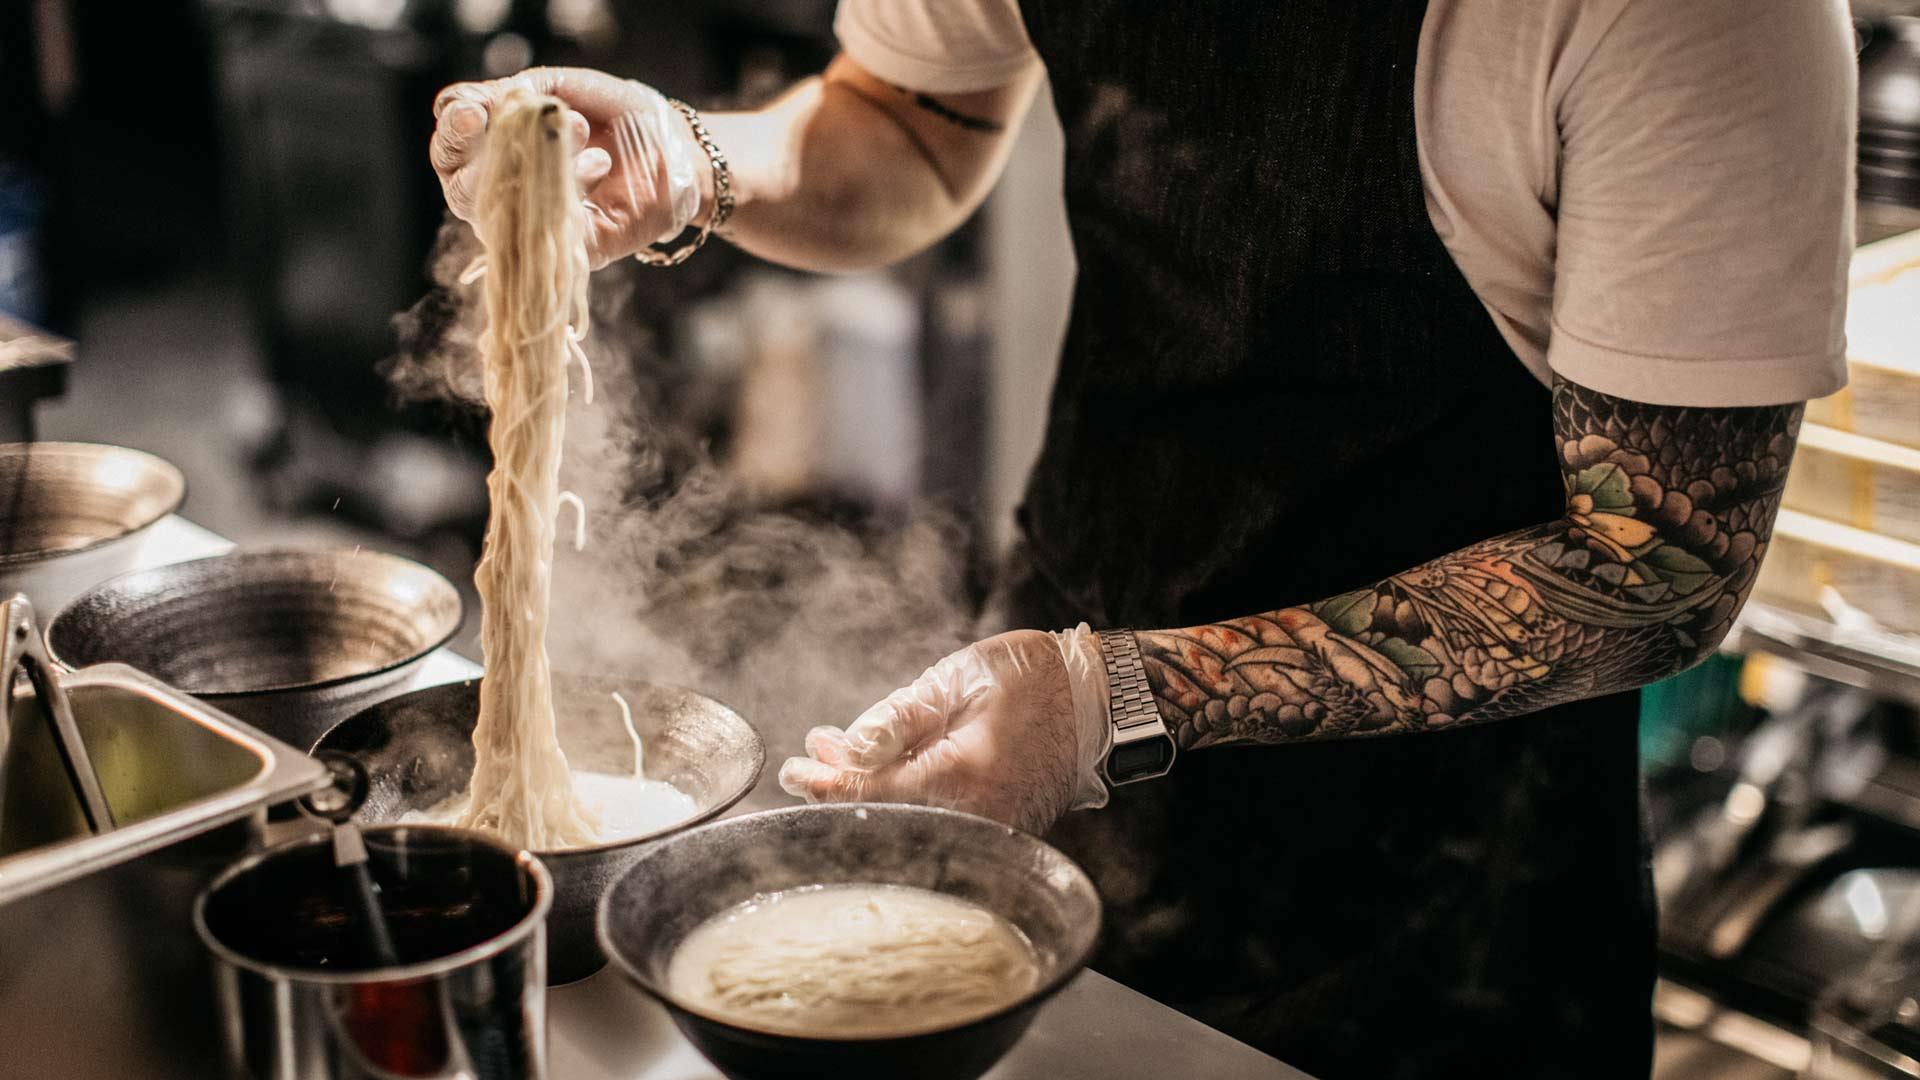 Sydney's Super-Popular RaRa Ramen Is Now Serving Up Its Brothy Bowls in Burleigh Heads